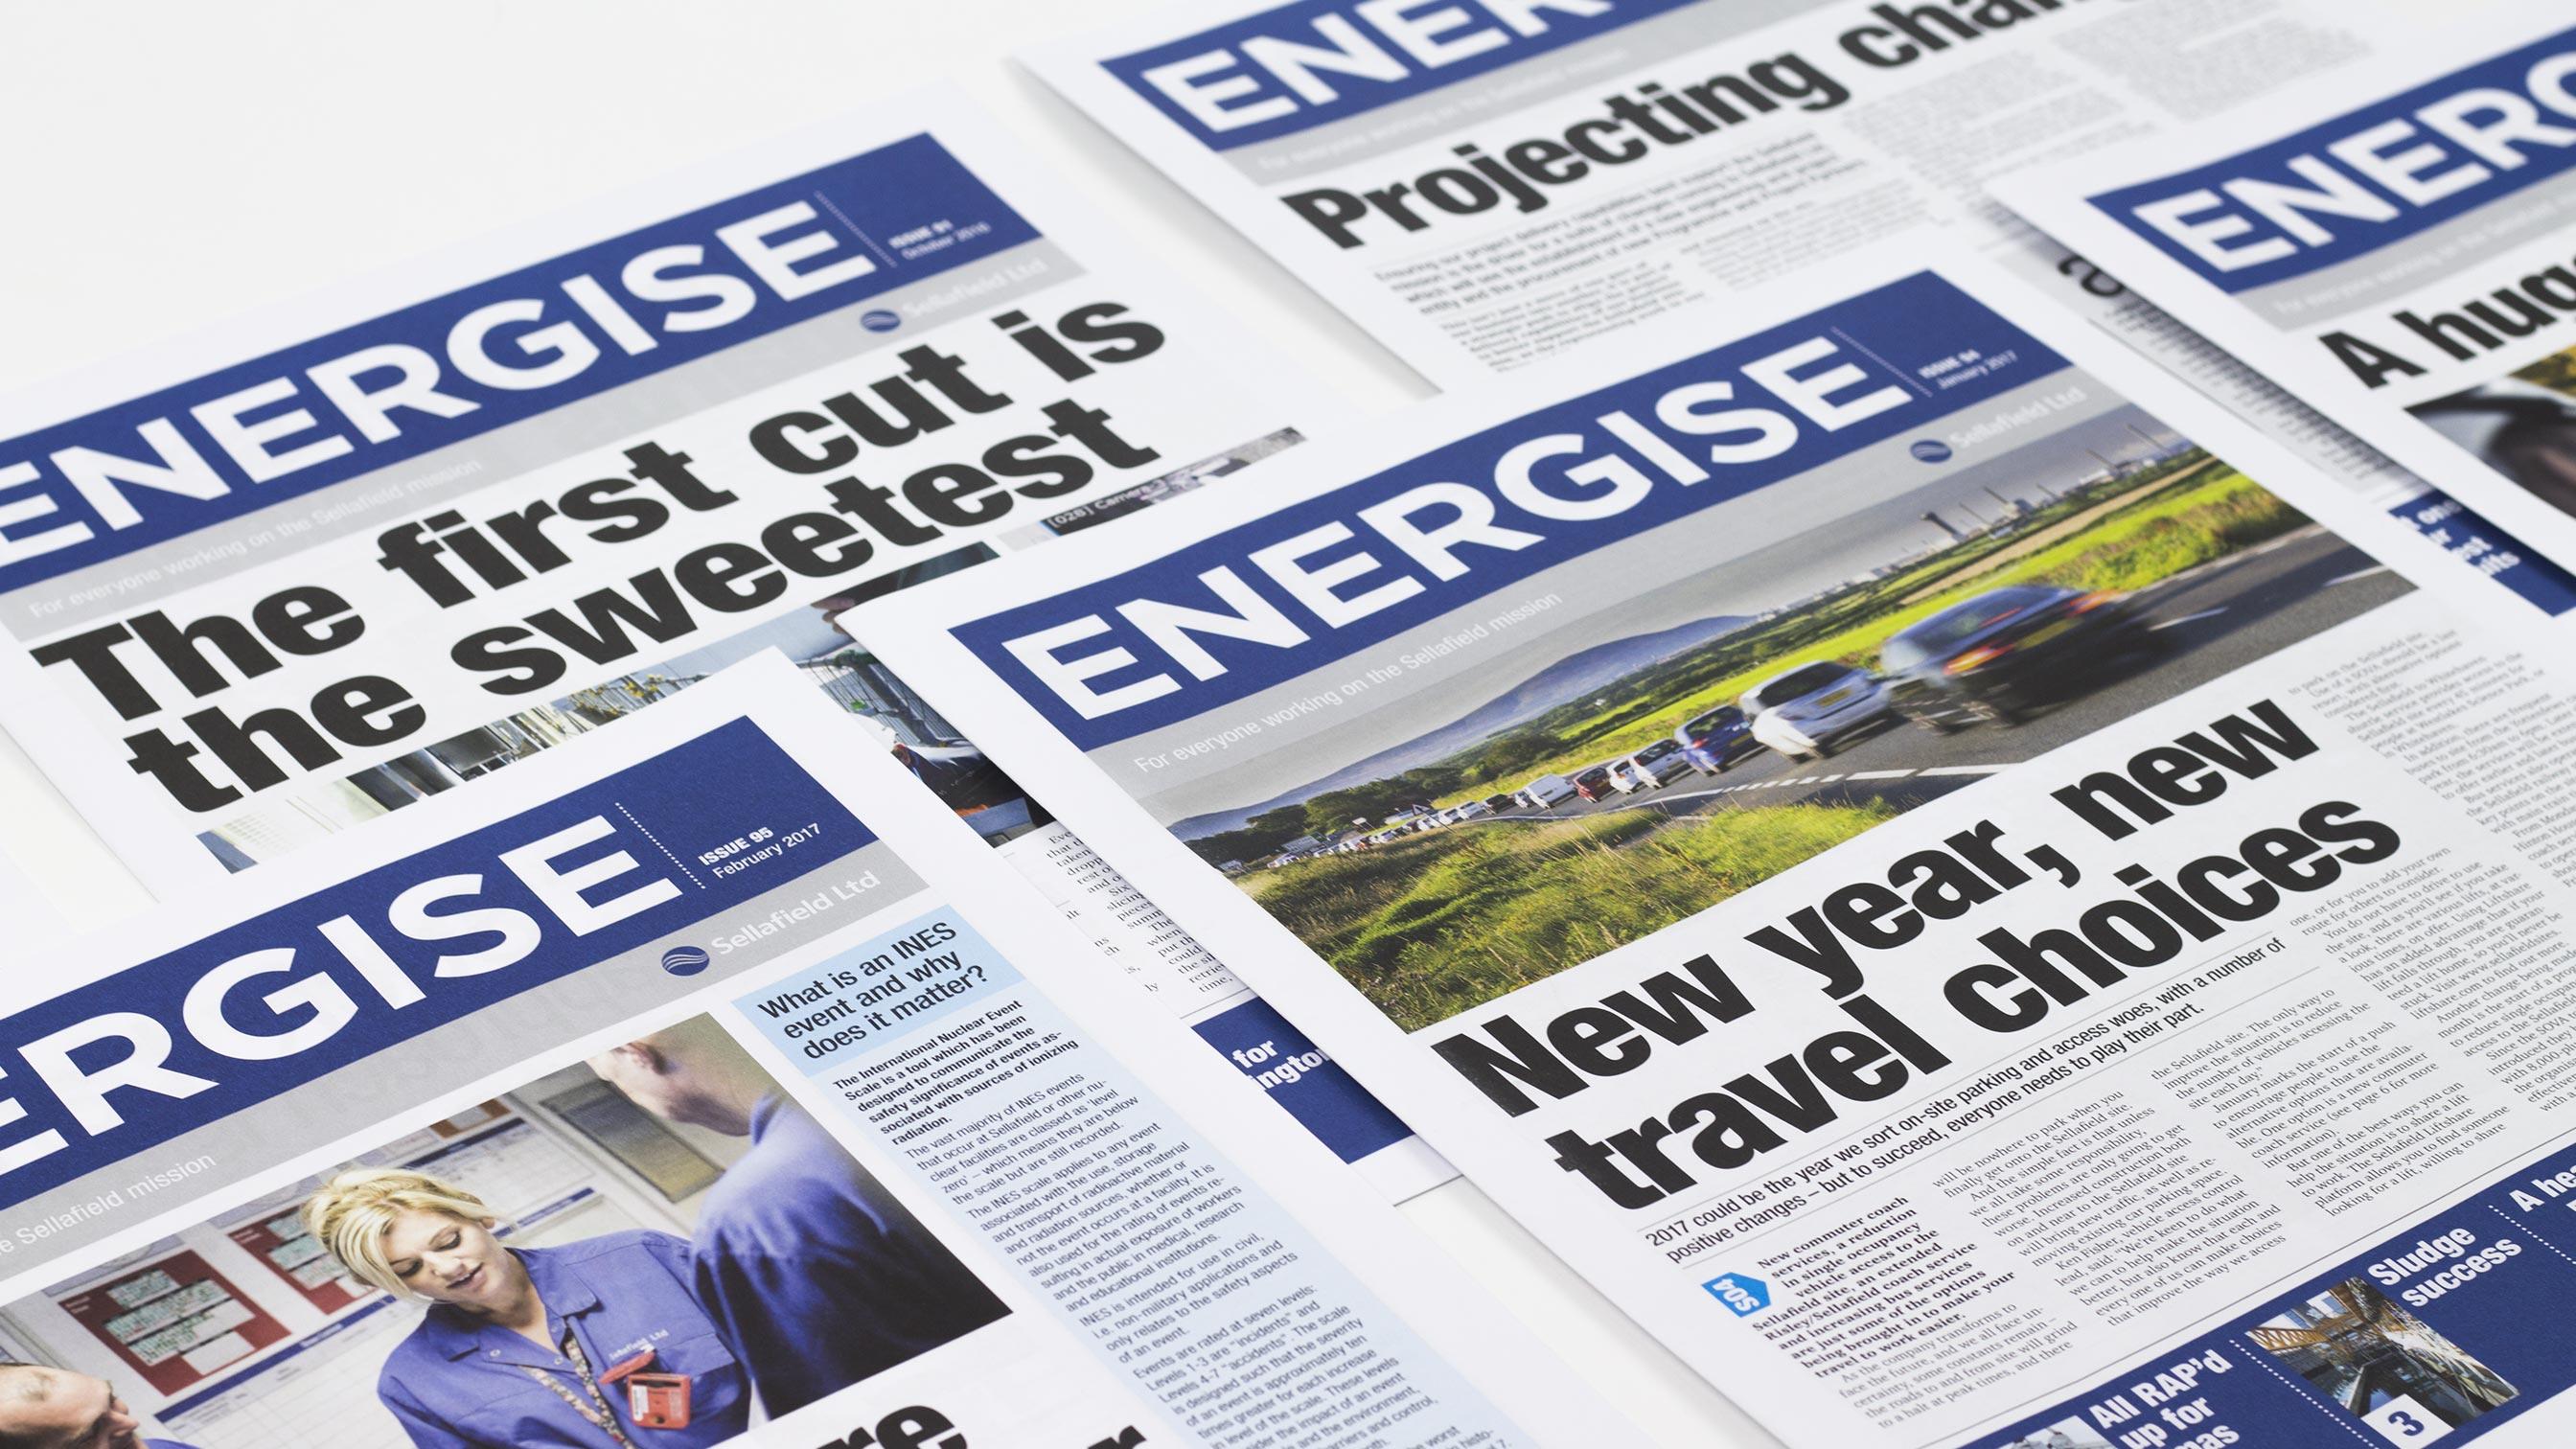 Sellafield Ltd Energise newspaper covers